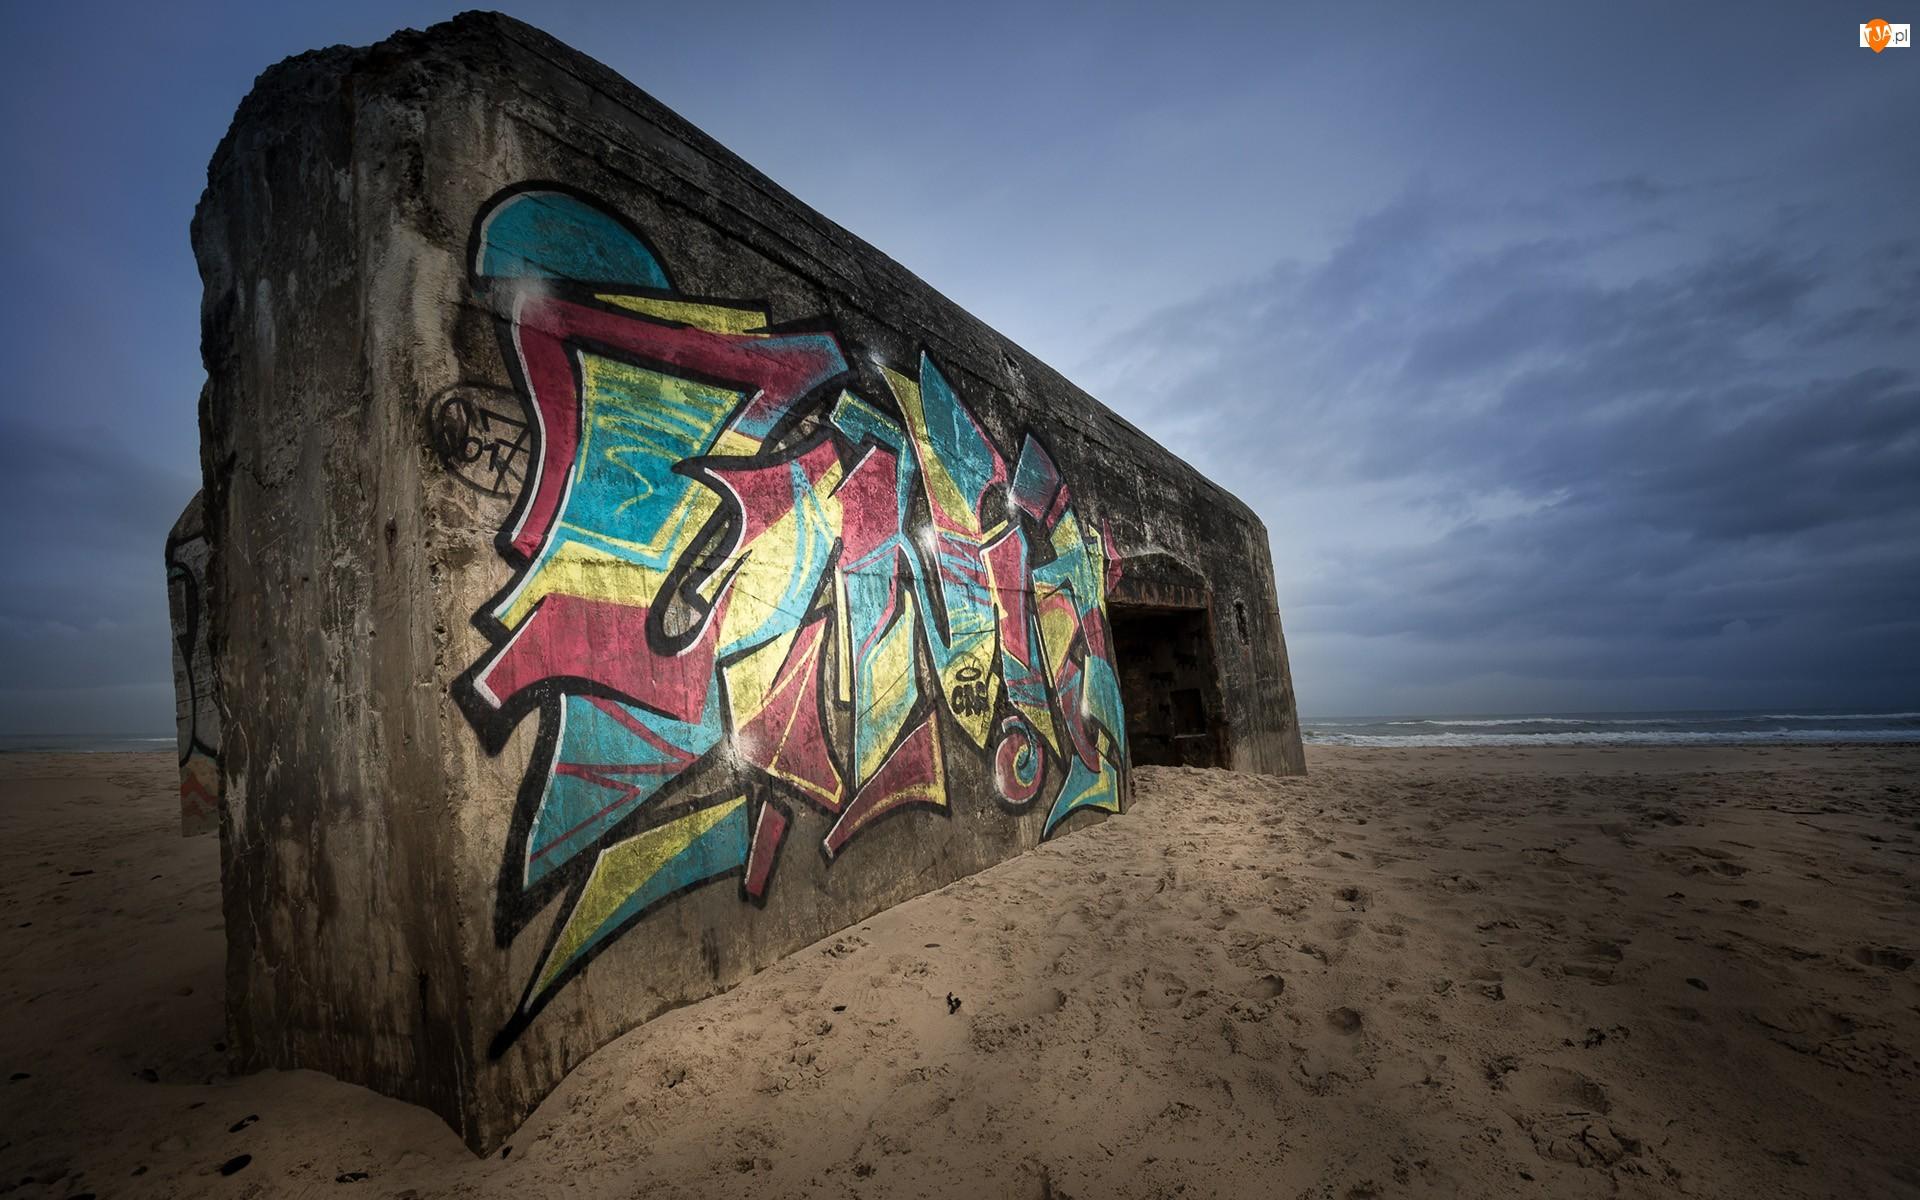 Betonowy, Plaża, Ściana, Morze, Blok, Graffiti